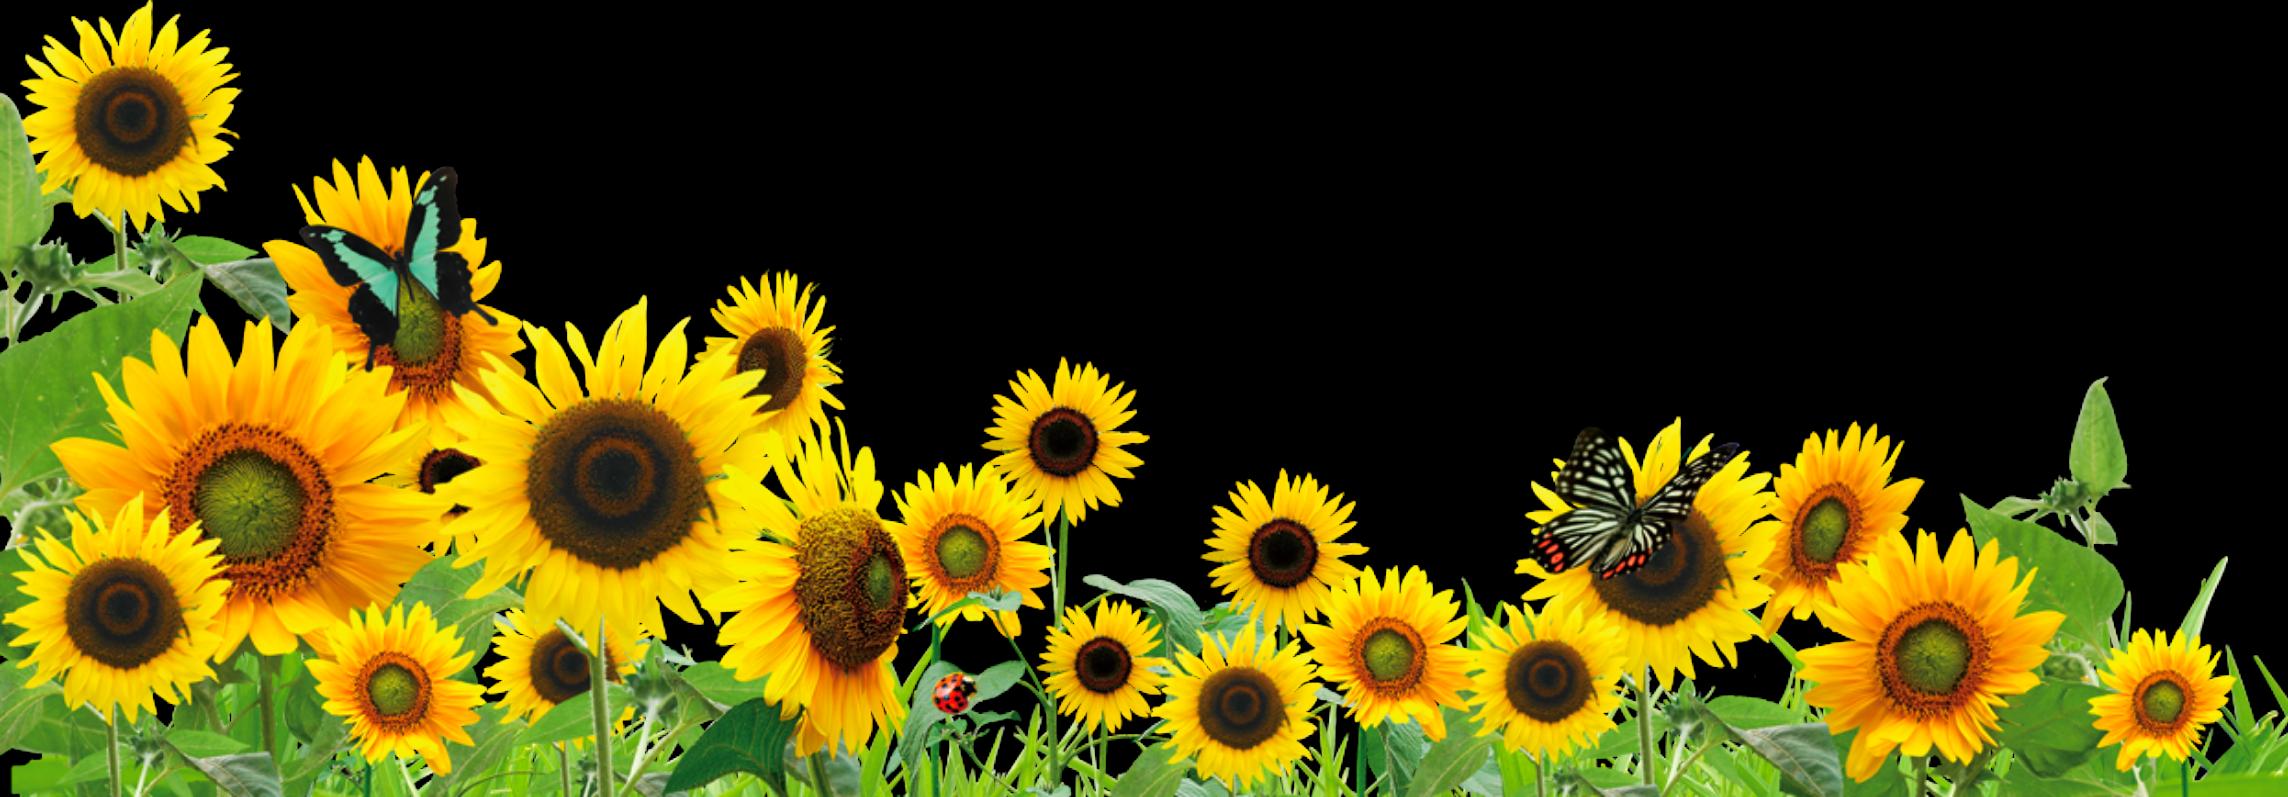 Ftestickers Flowers Sunflowers Butterfly Border